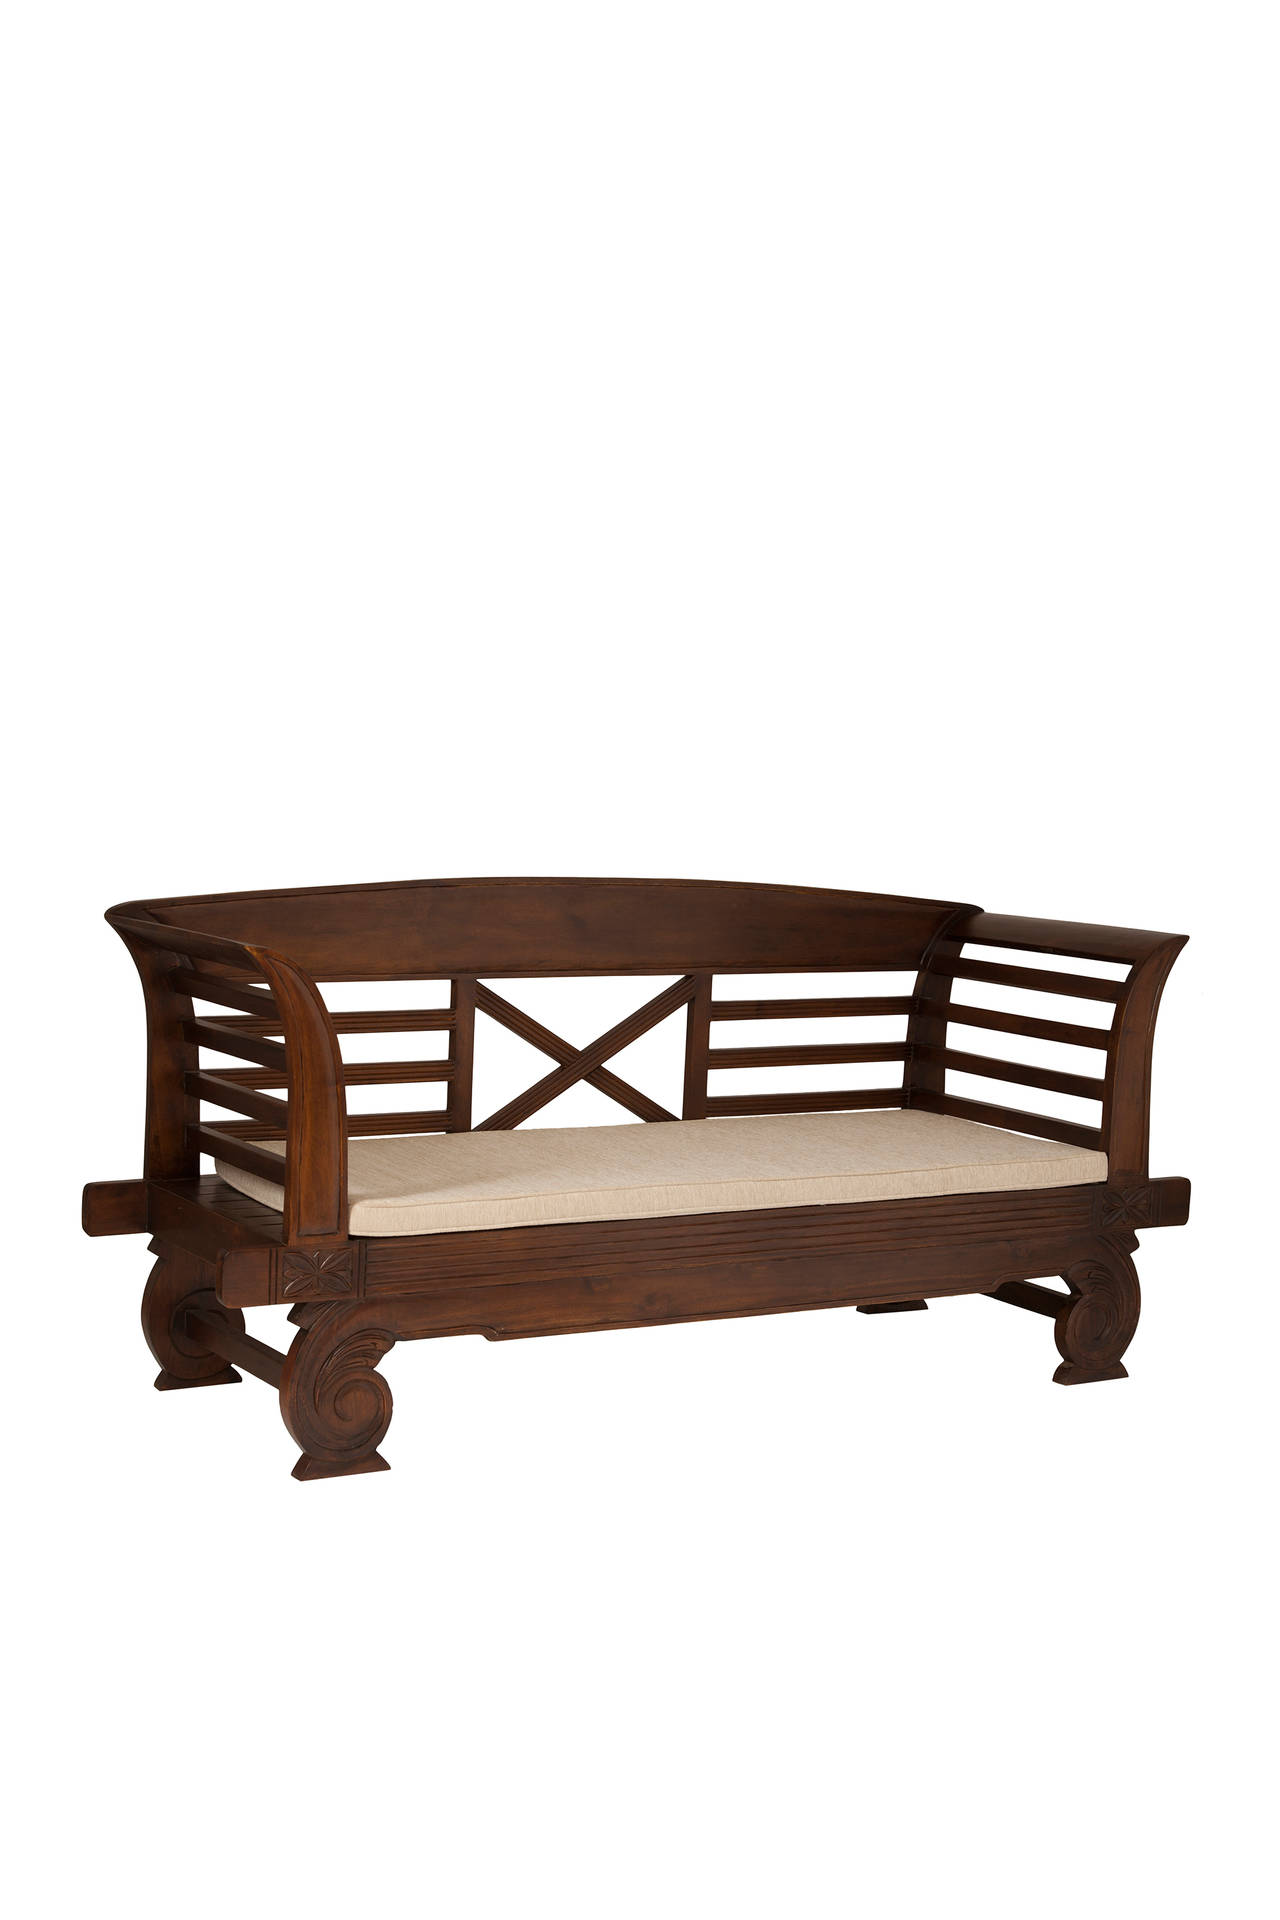 Marocco bench